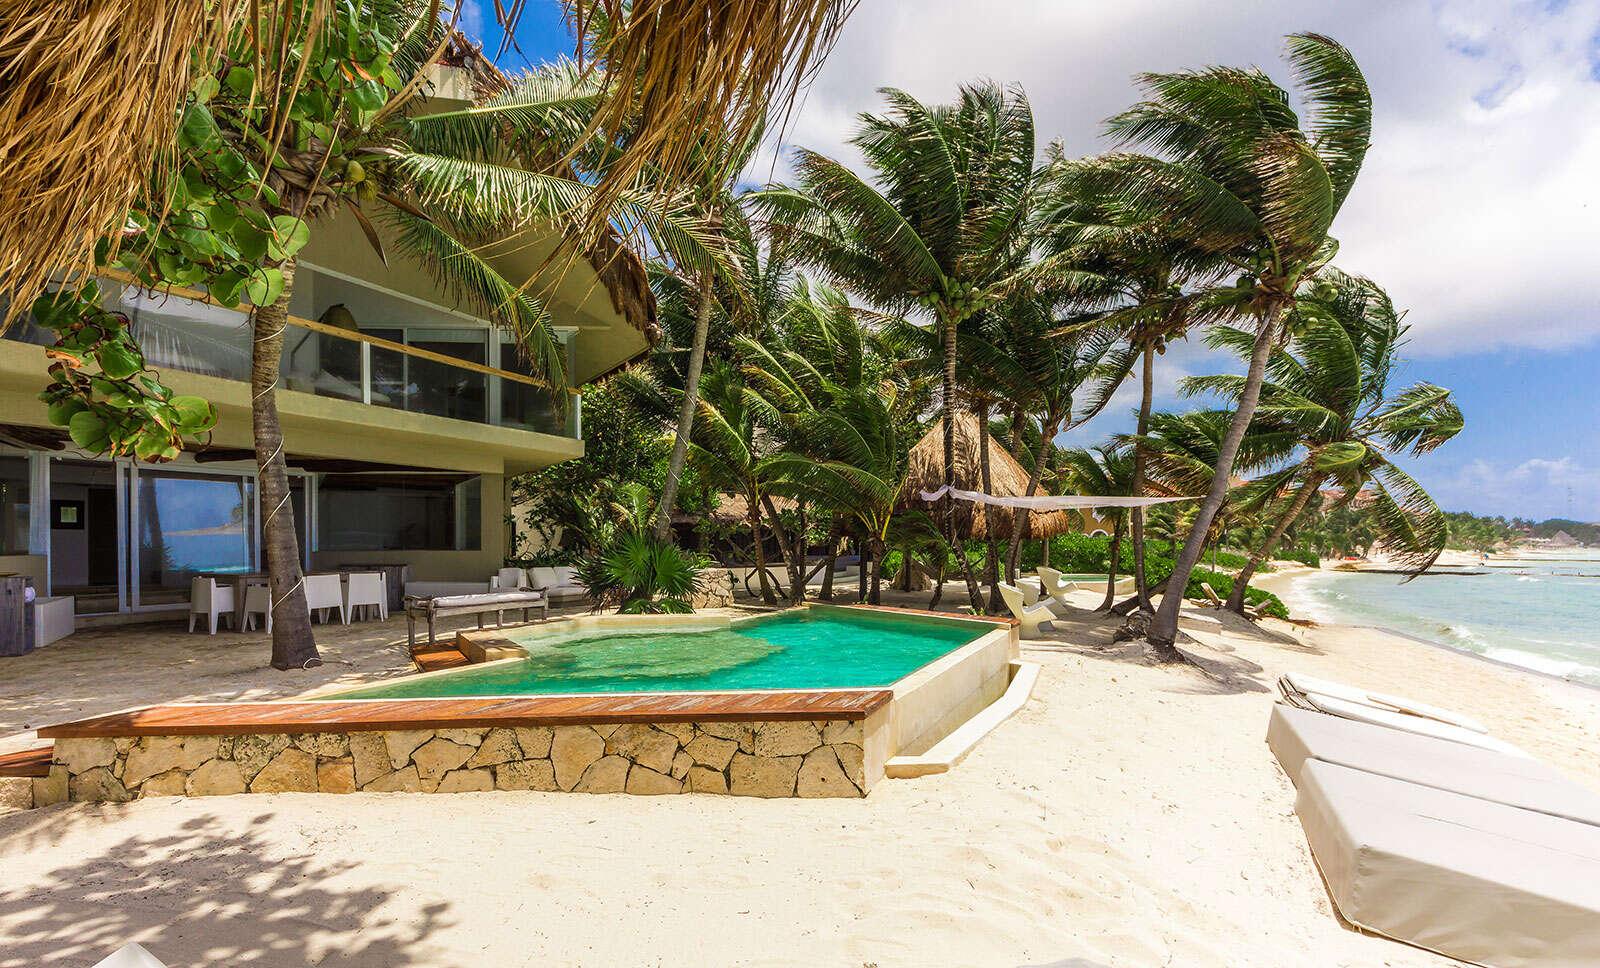 Luxury vacation rentals mexico - Riviera maya - Puerto aventuras - Zacil Na - Image 1/31